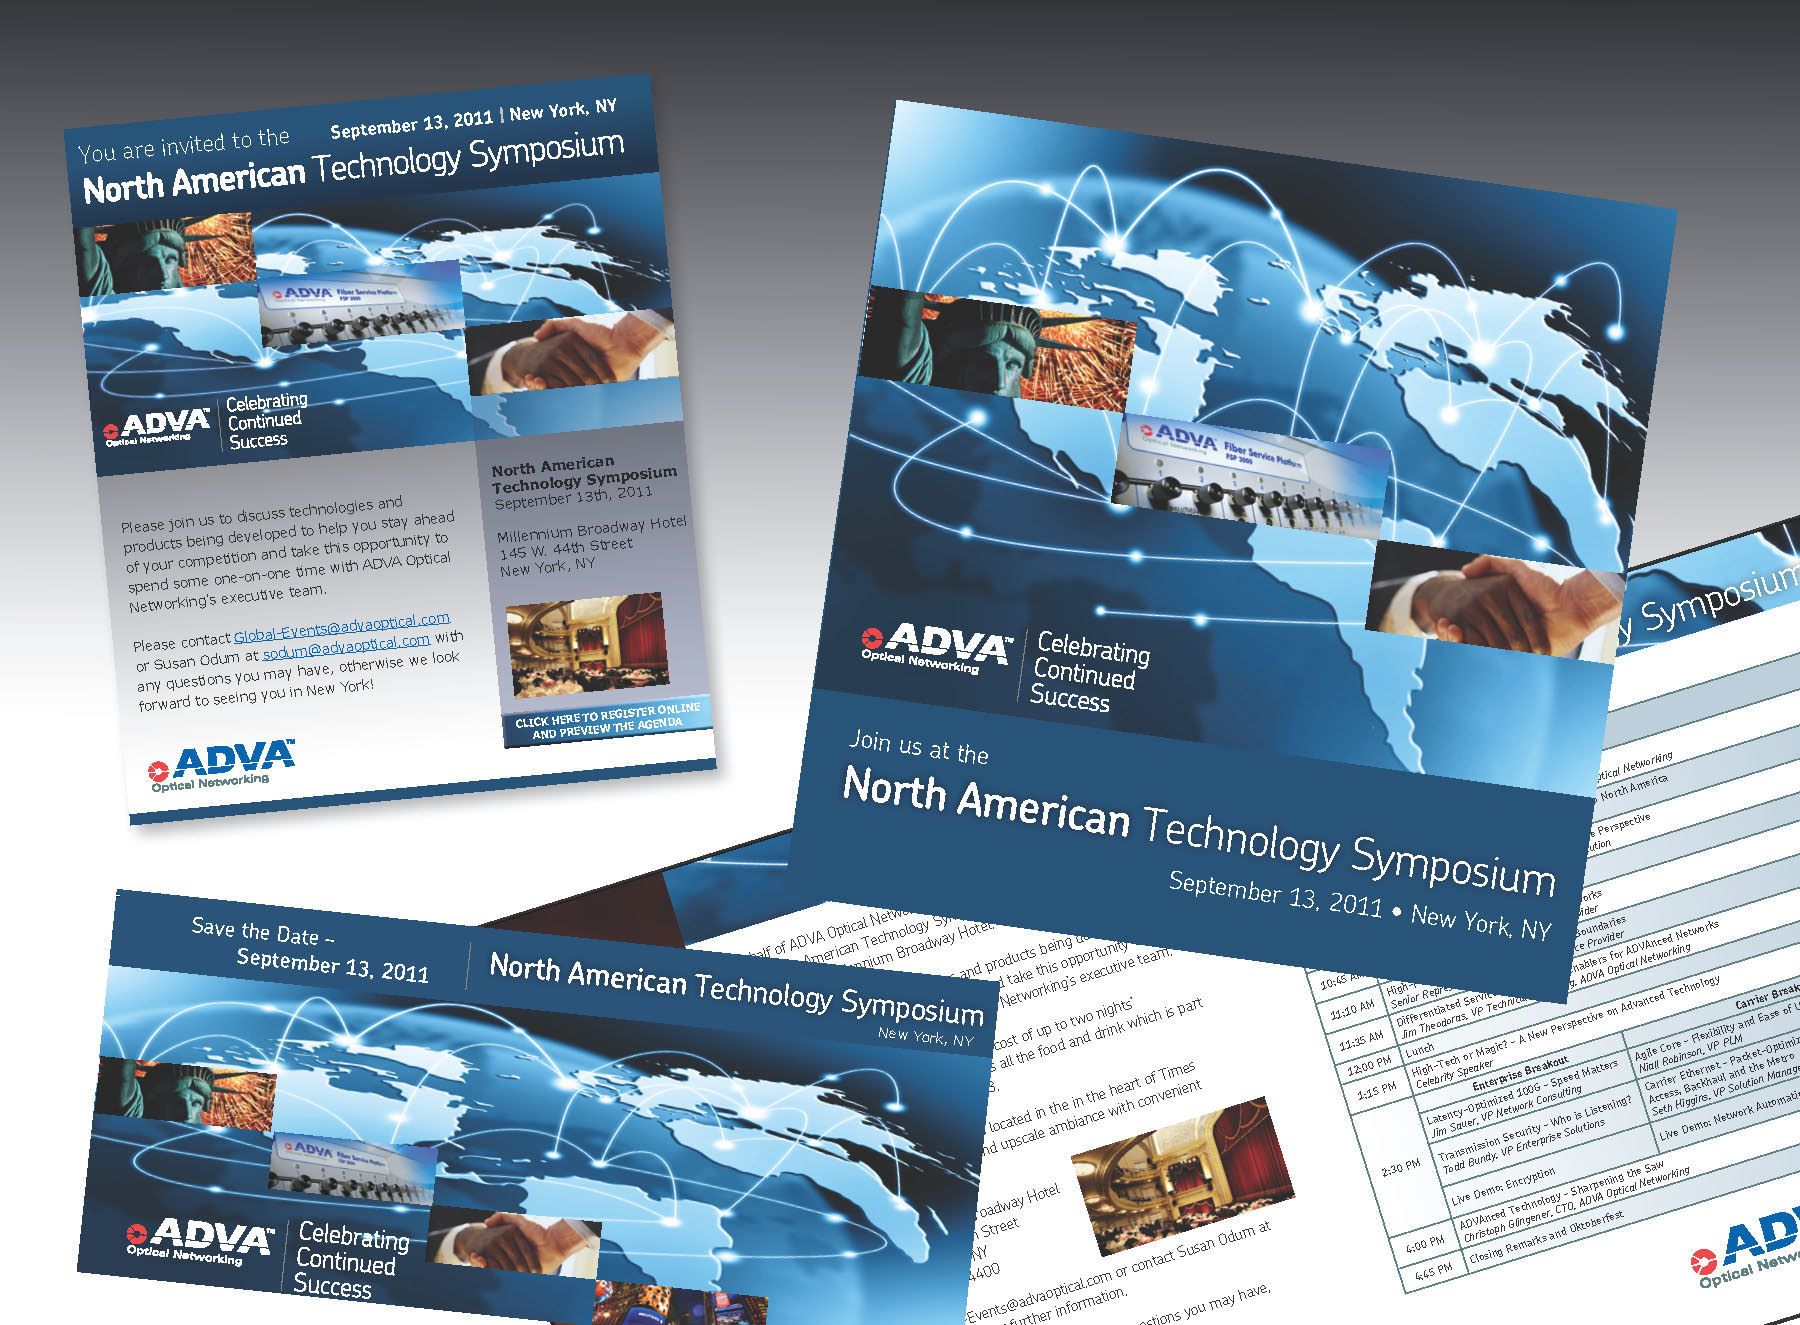 ADVA Optical Networkiing